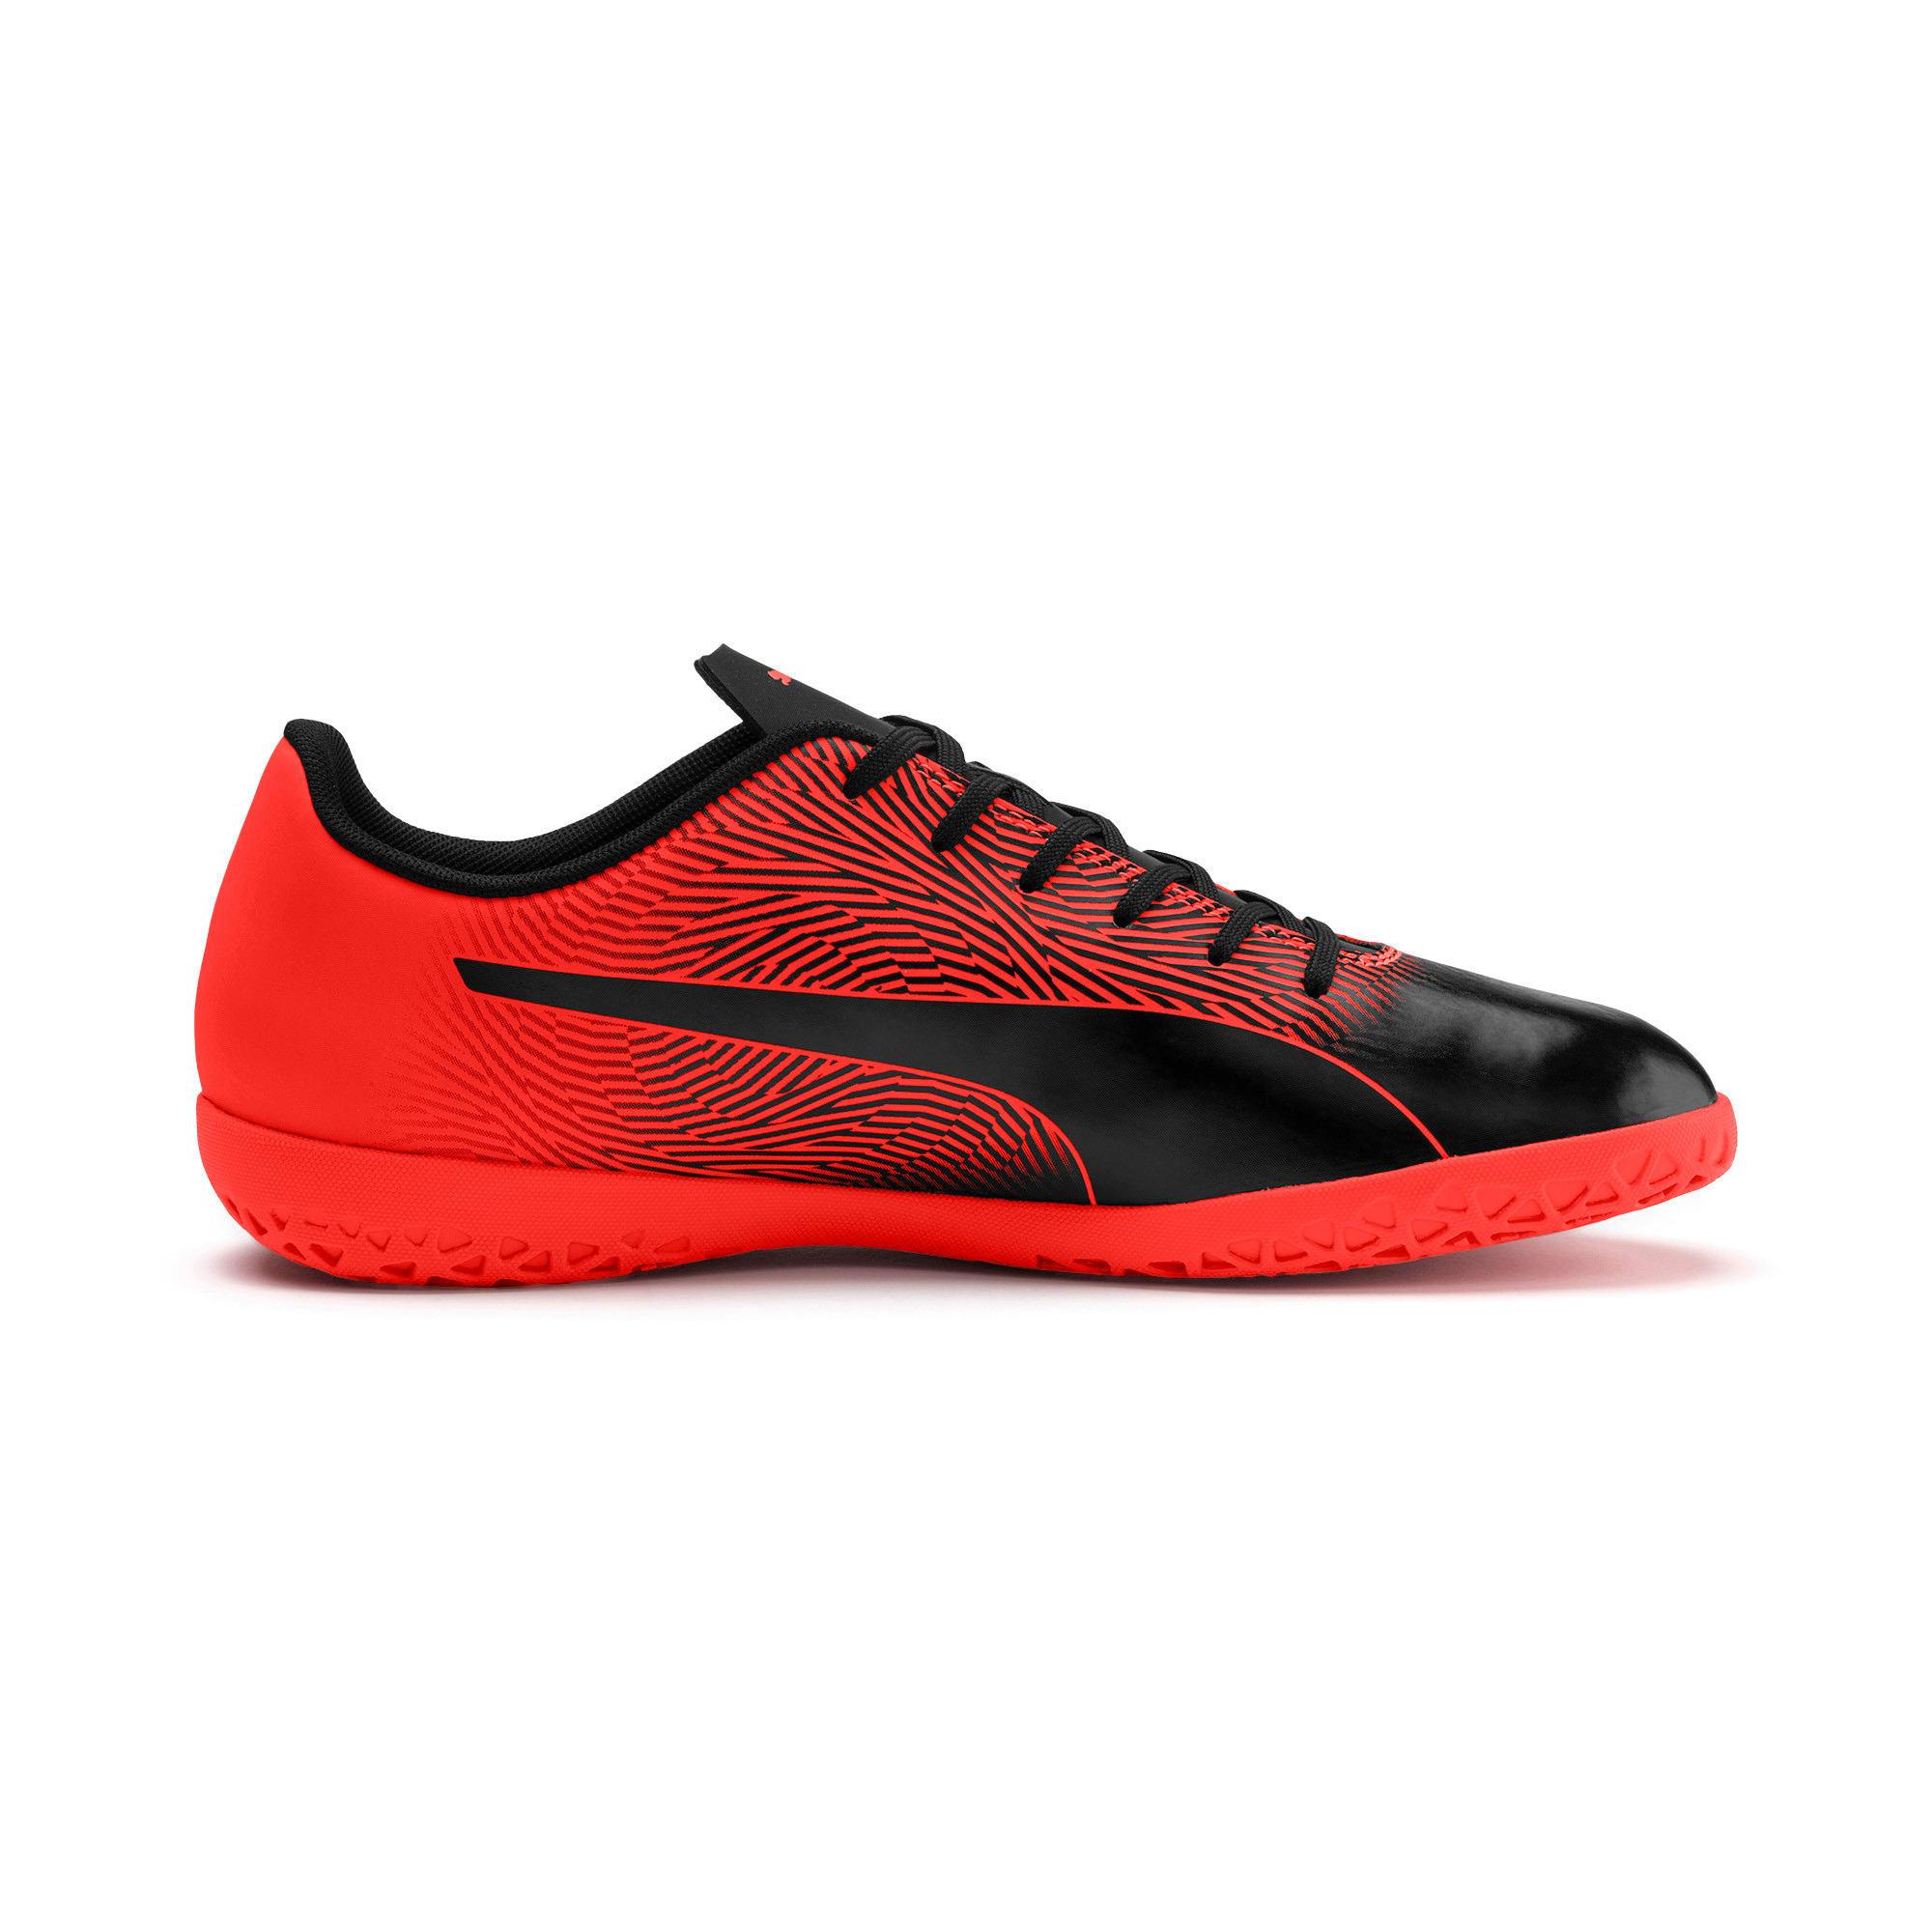 Thumbnail 6 of PUMA Spirit II IT Men's Soccer Shoes, Puma Black-Nrgy Red, medium